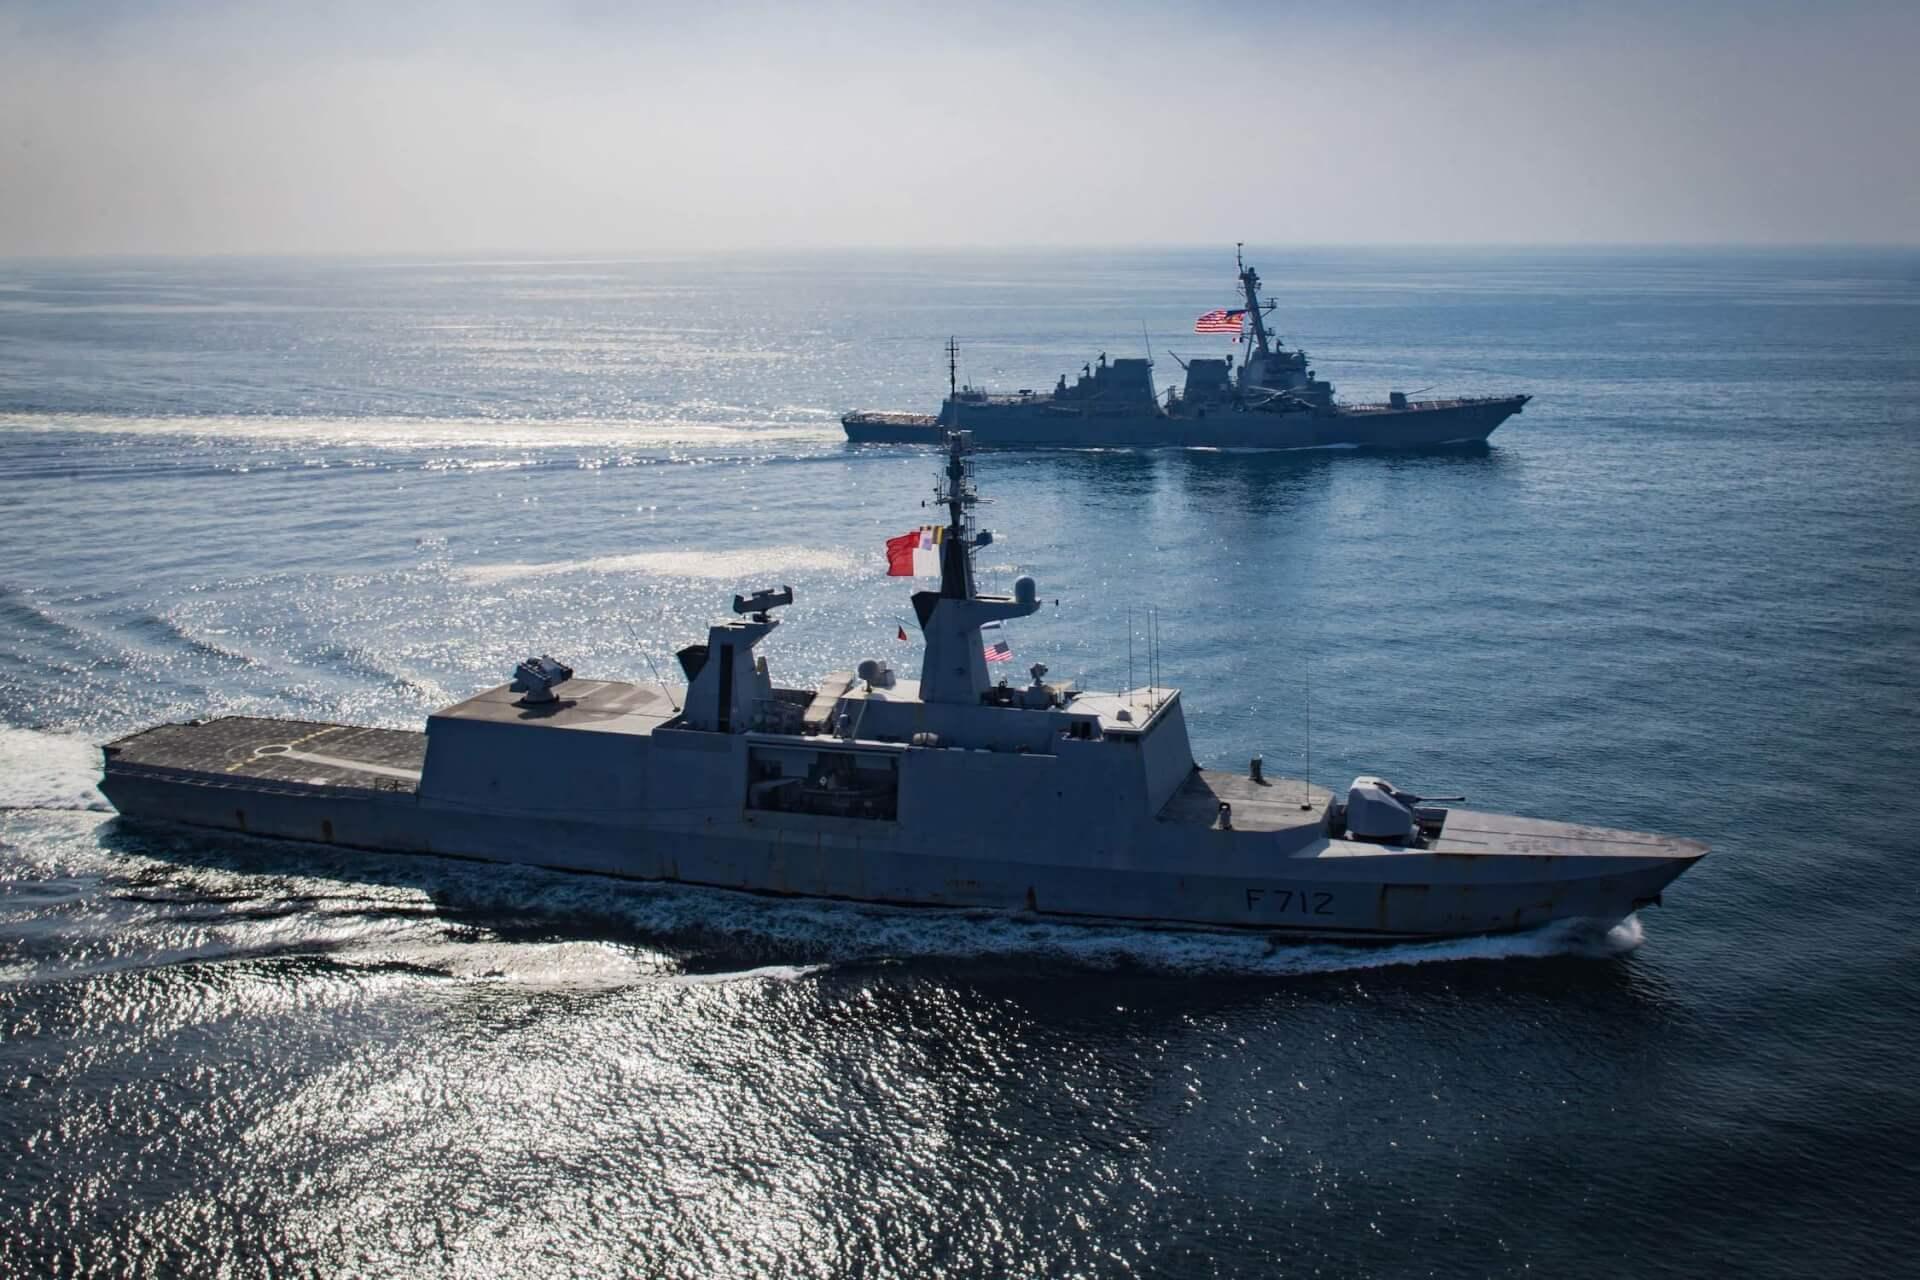 Denmark Will Send Reinforced Patrols To The Strait of Hormuz